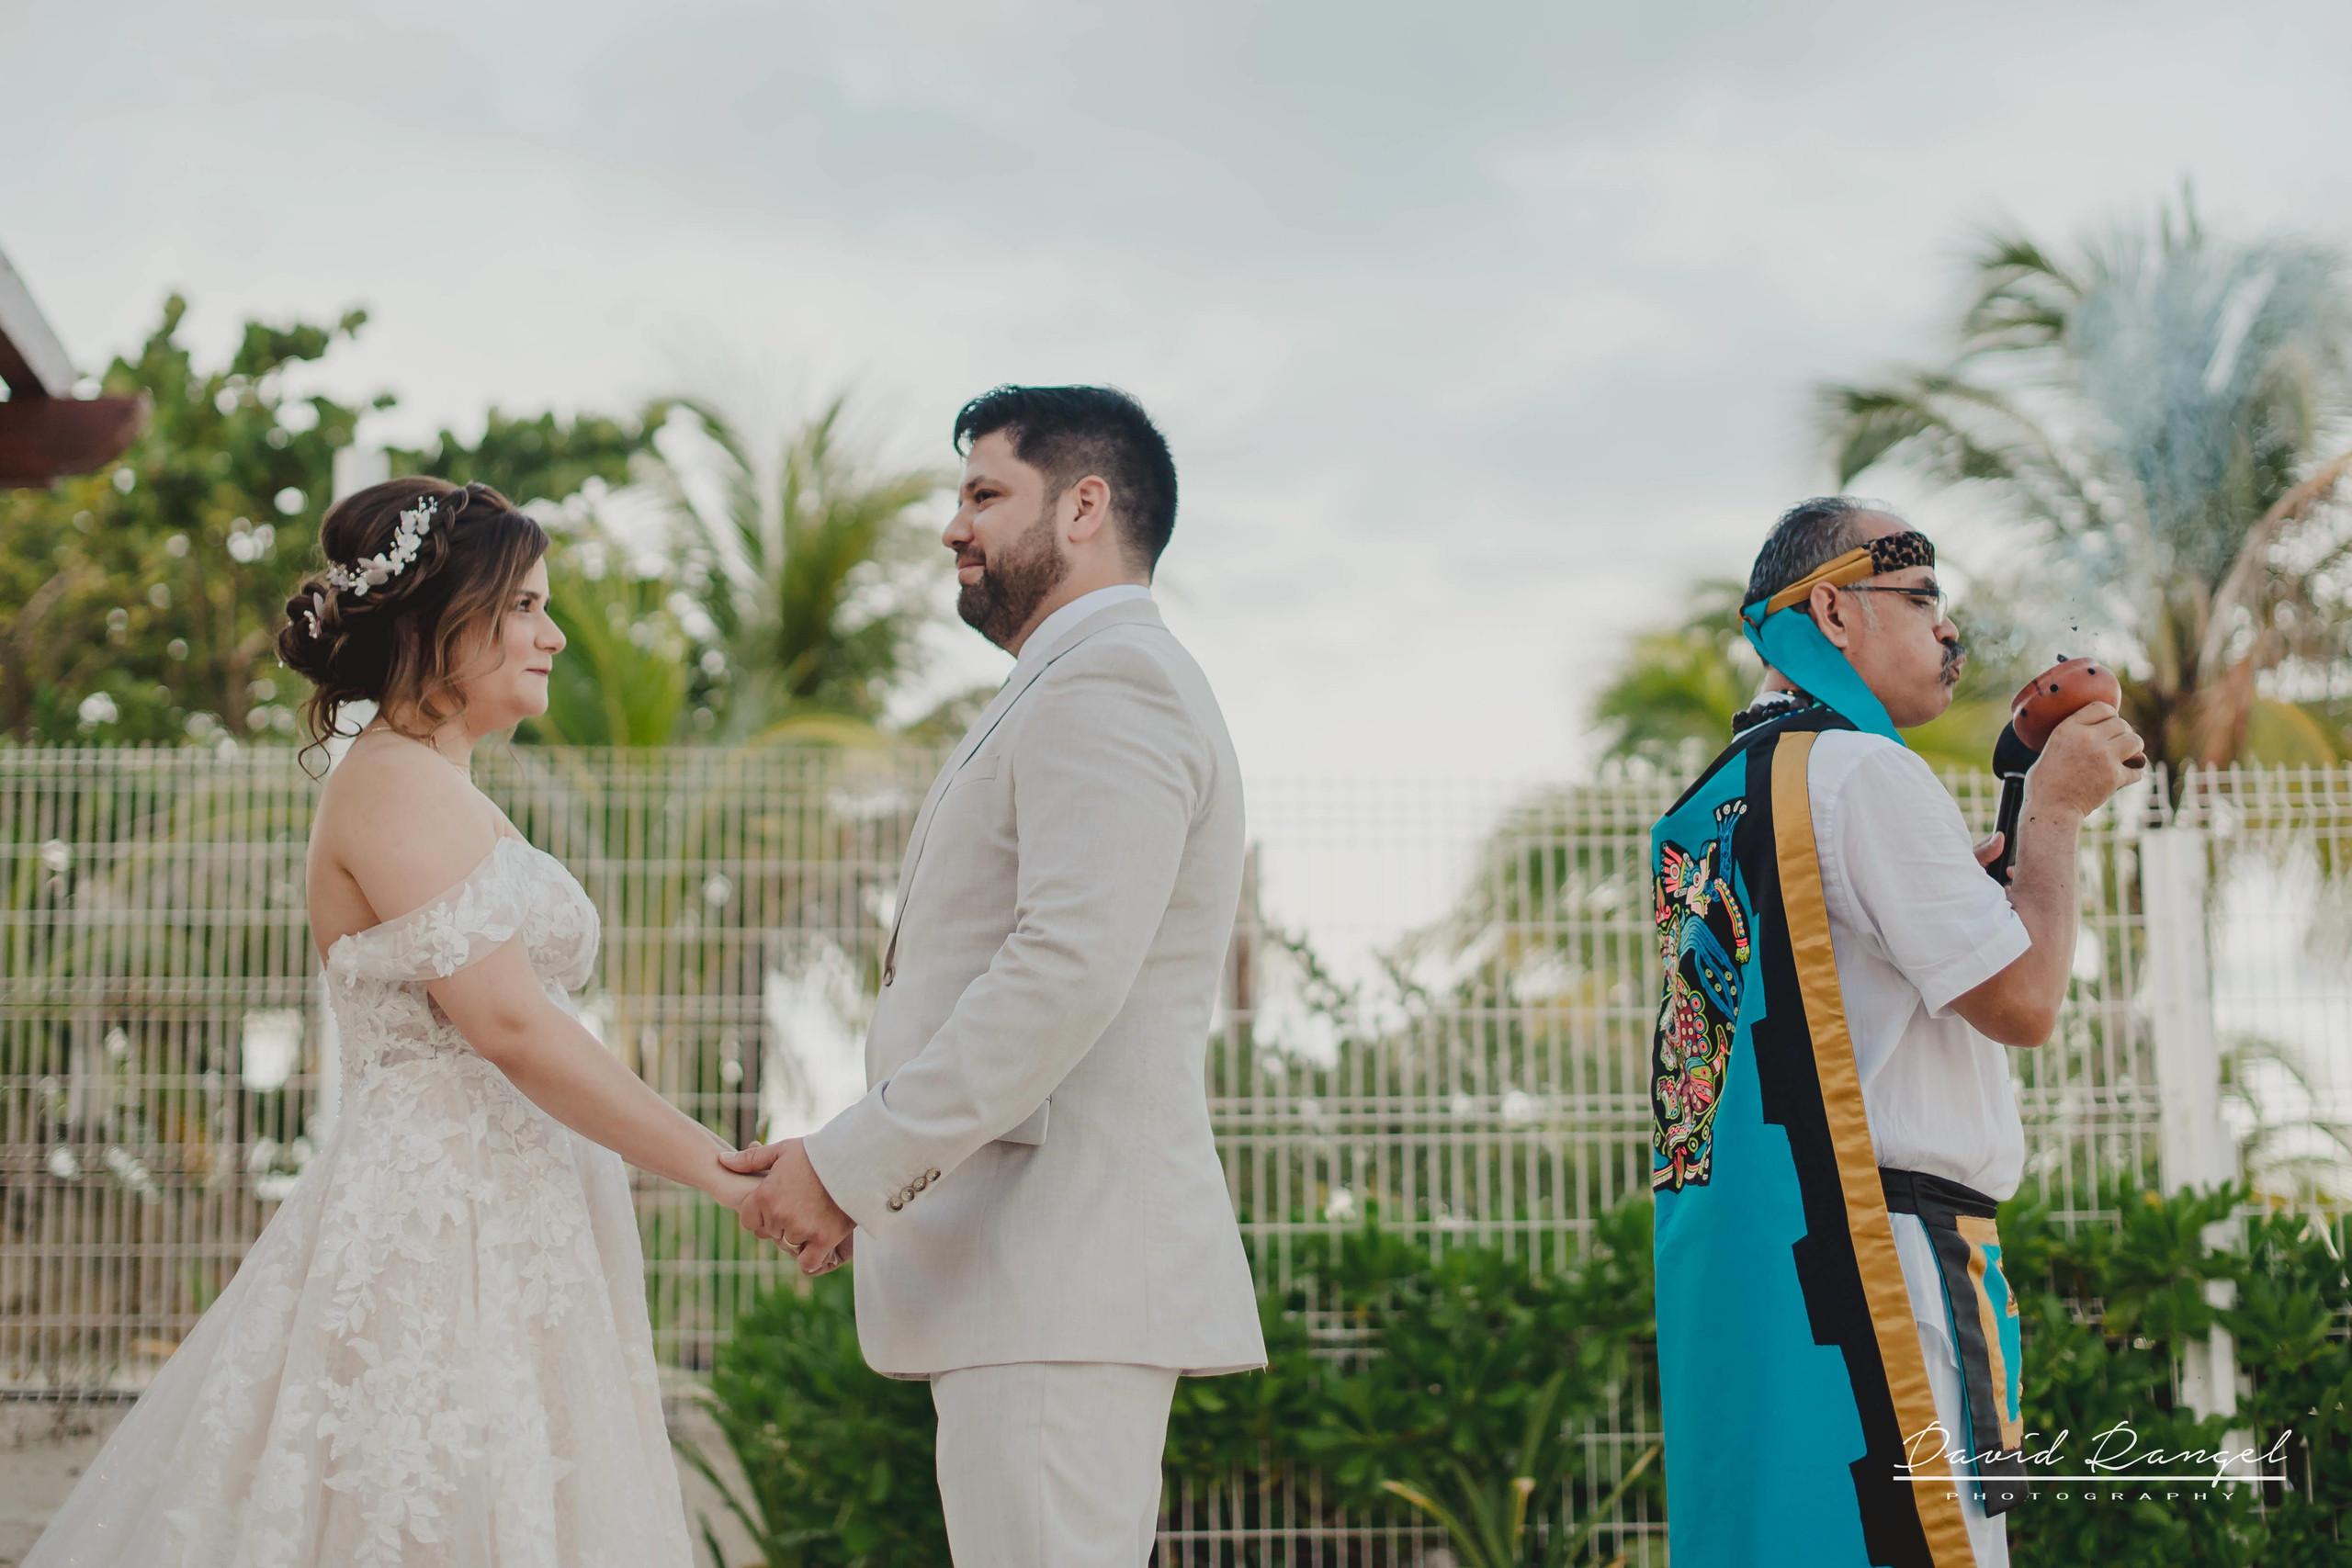 groom+bride+wedding+ceremony+dress+villa+chenera+isla+blanca+costa+mujeres+garden+beach+chaman+traditional+mayan+wedding